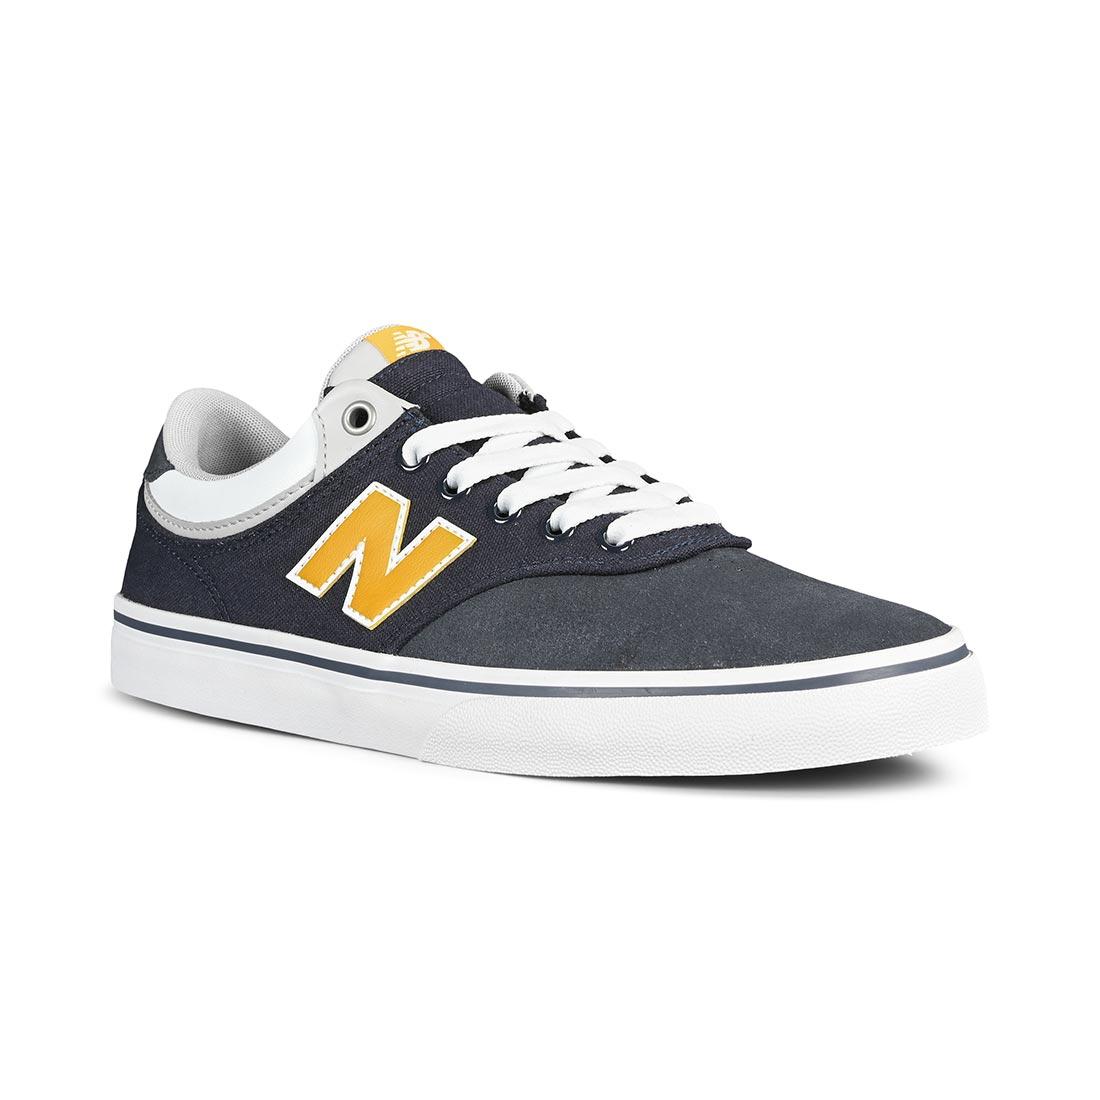 New Balance Numeric 255 Shoes - Navy